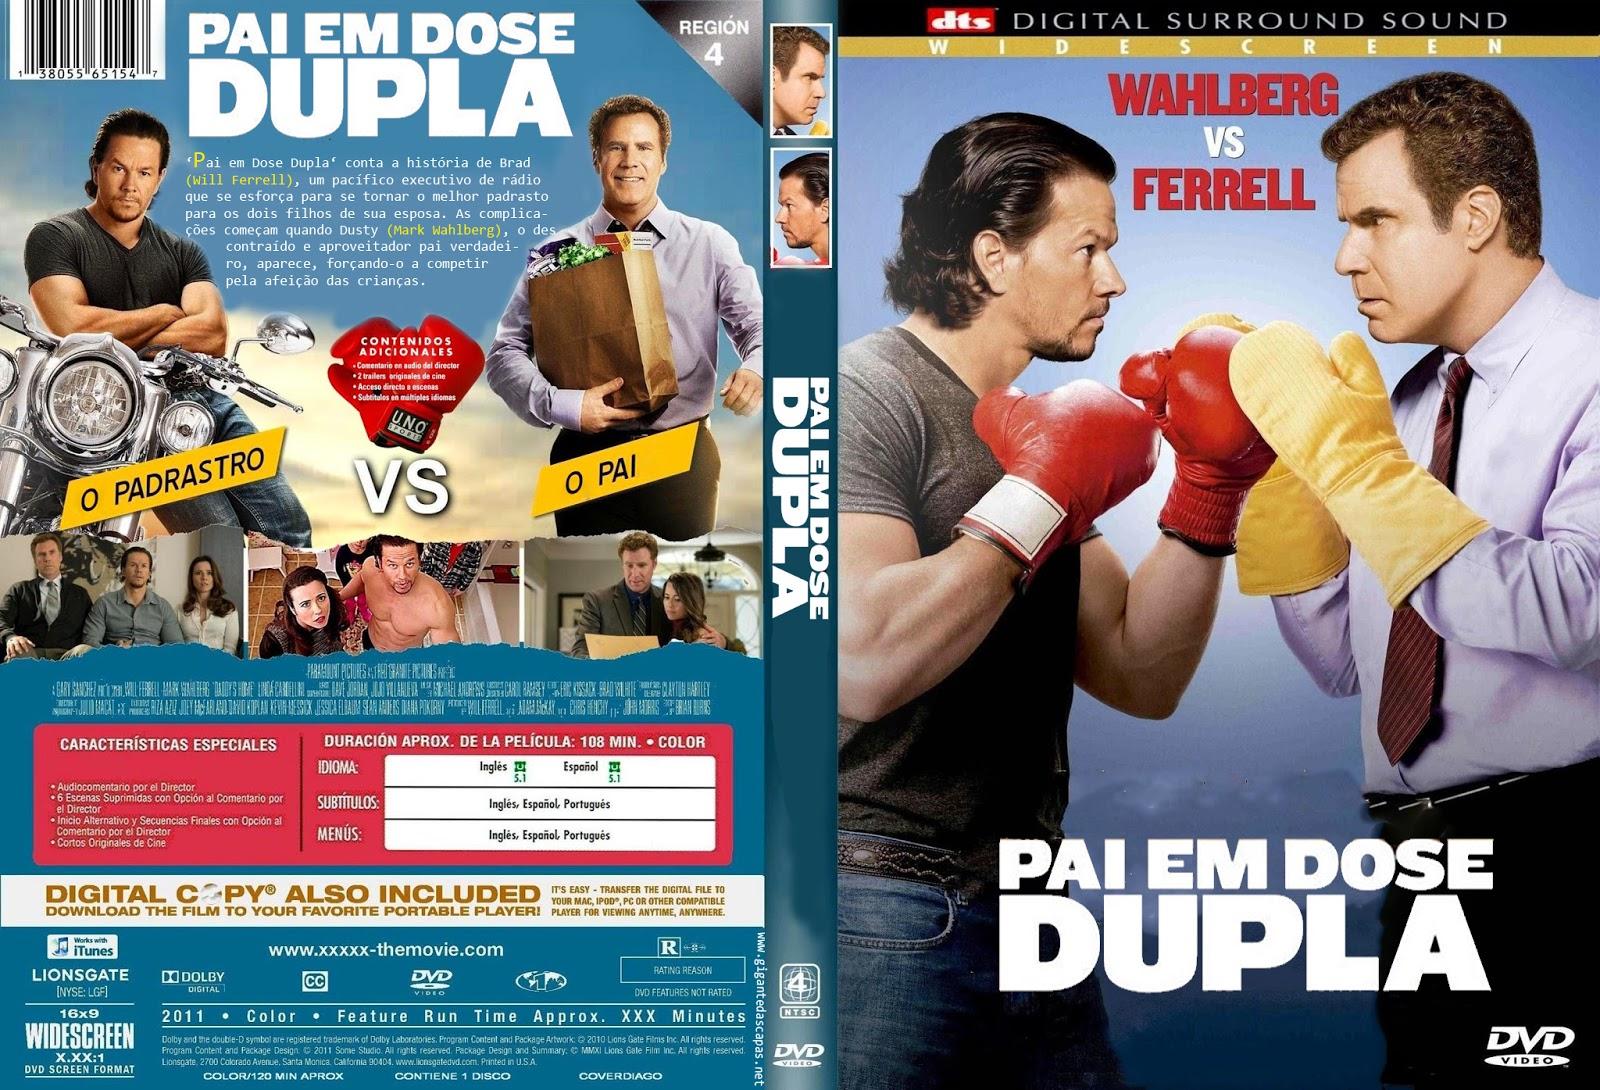 Download Pai em Dose Dupla DVD-R Pai 2Bem 2BDose 2BDupla 2B 25282016 2529